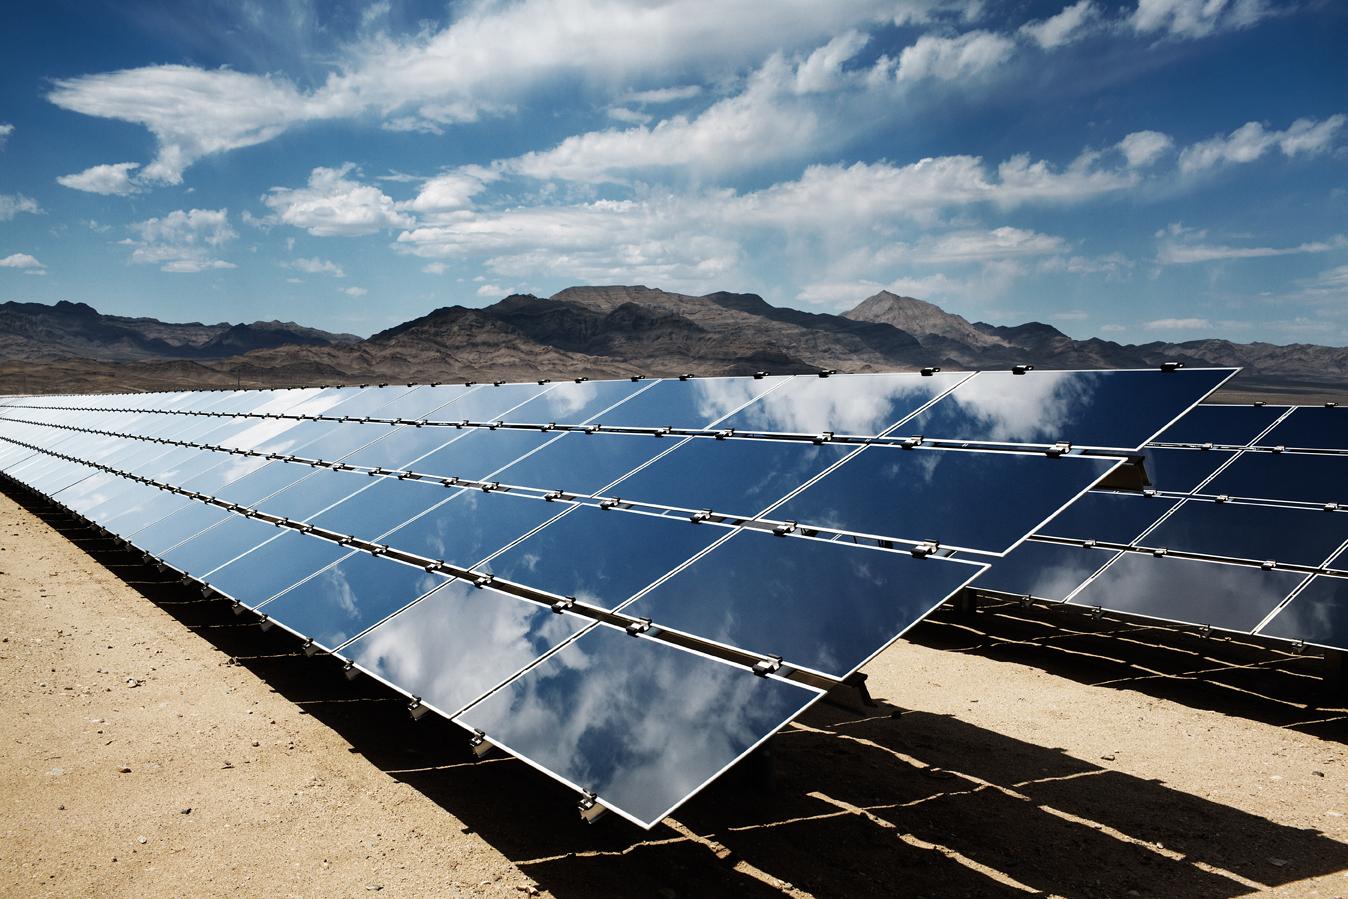 Enbridge Dedicates 50-MW Silver State North Solar Project